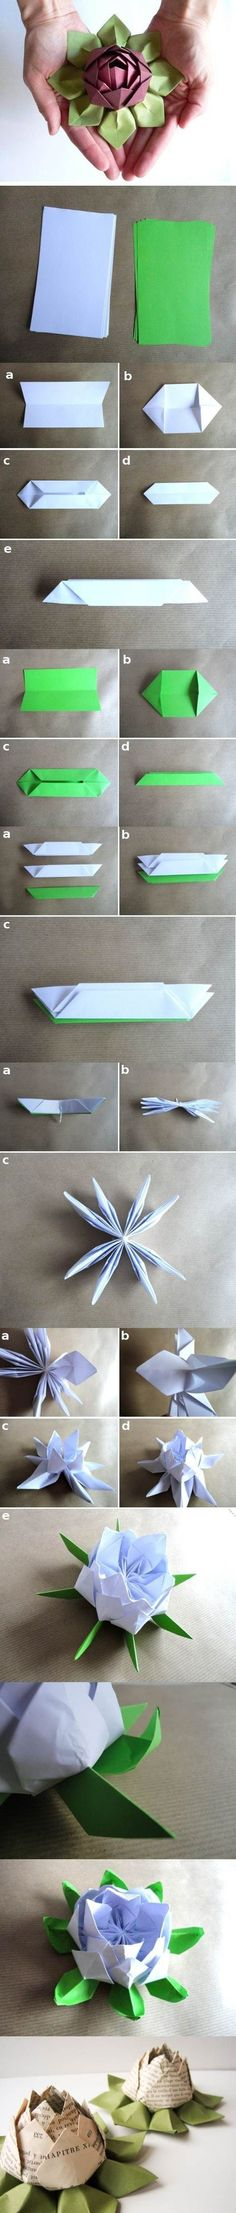 DIY Origami Lotus Flower   iCreativeIdeas.com Like Us on Facebook ==> www.facebook.com/...